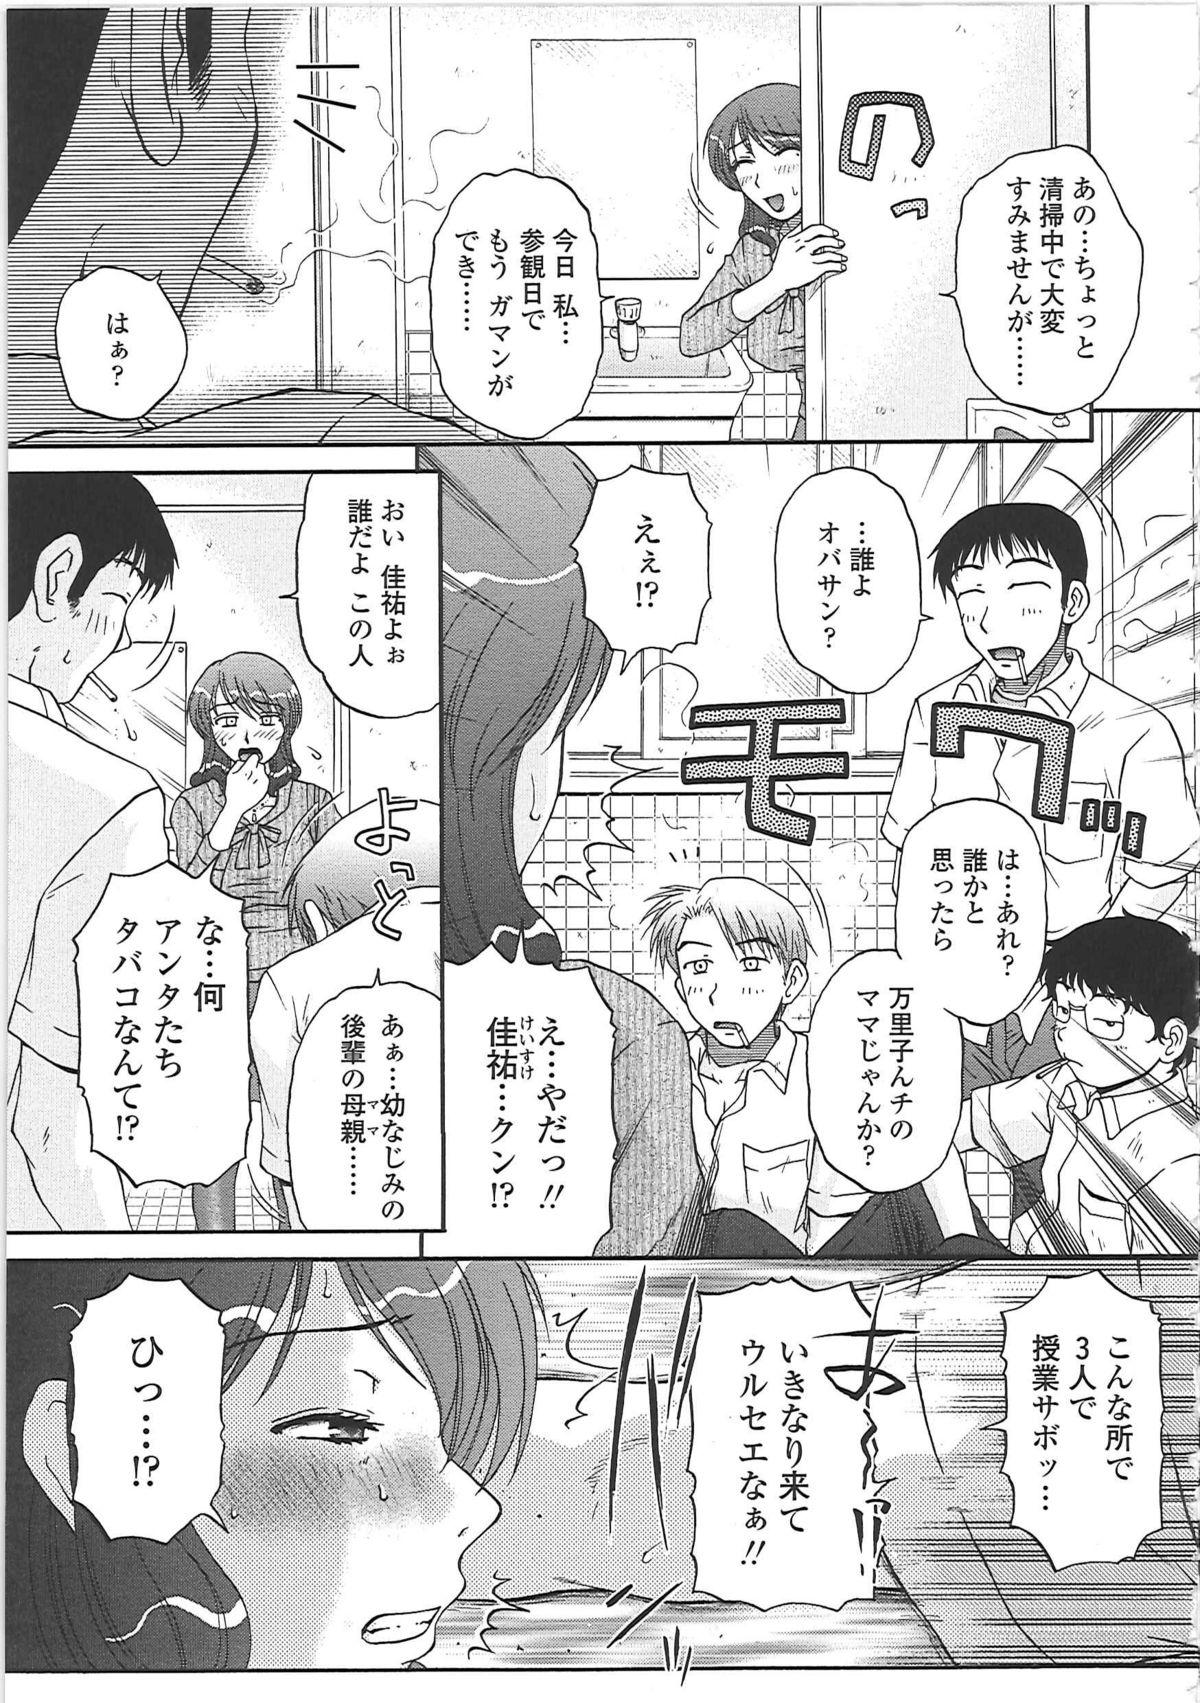 Nikuzuma Tsuushin - Erotic Wife Communication 113